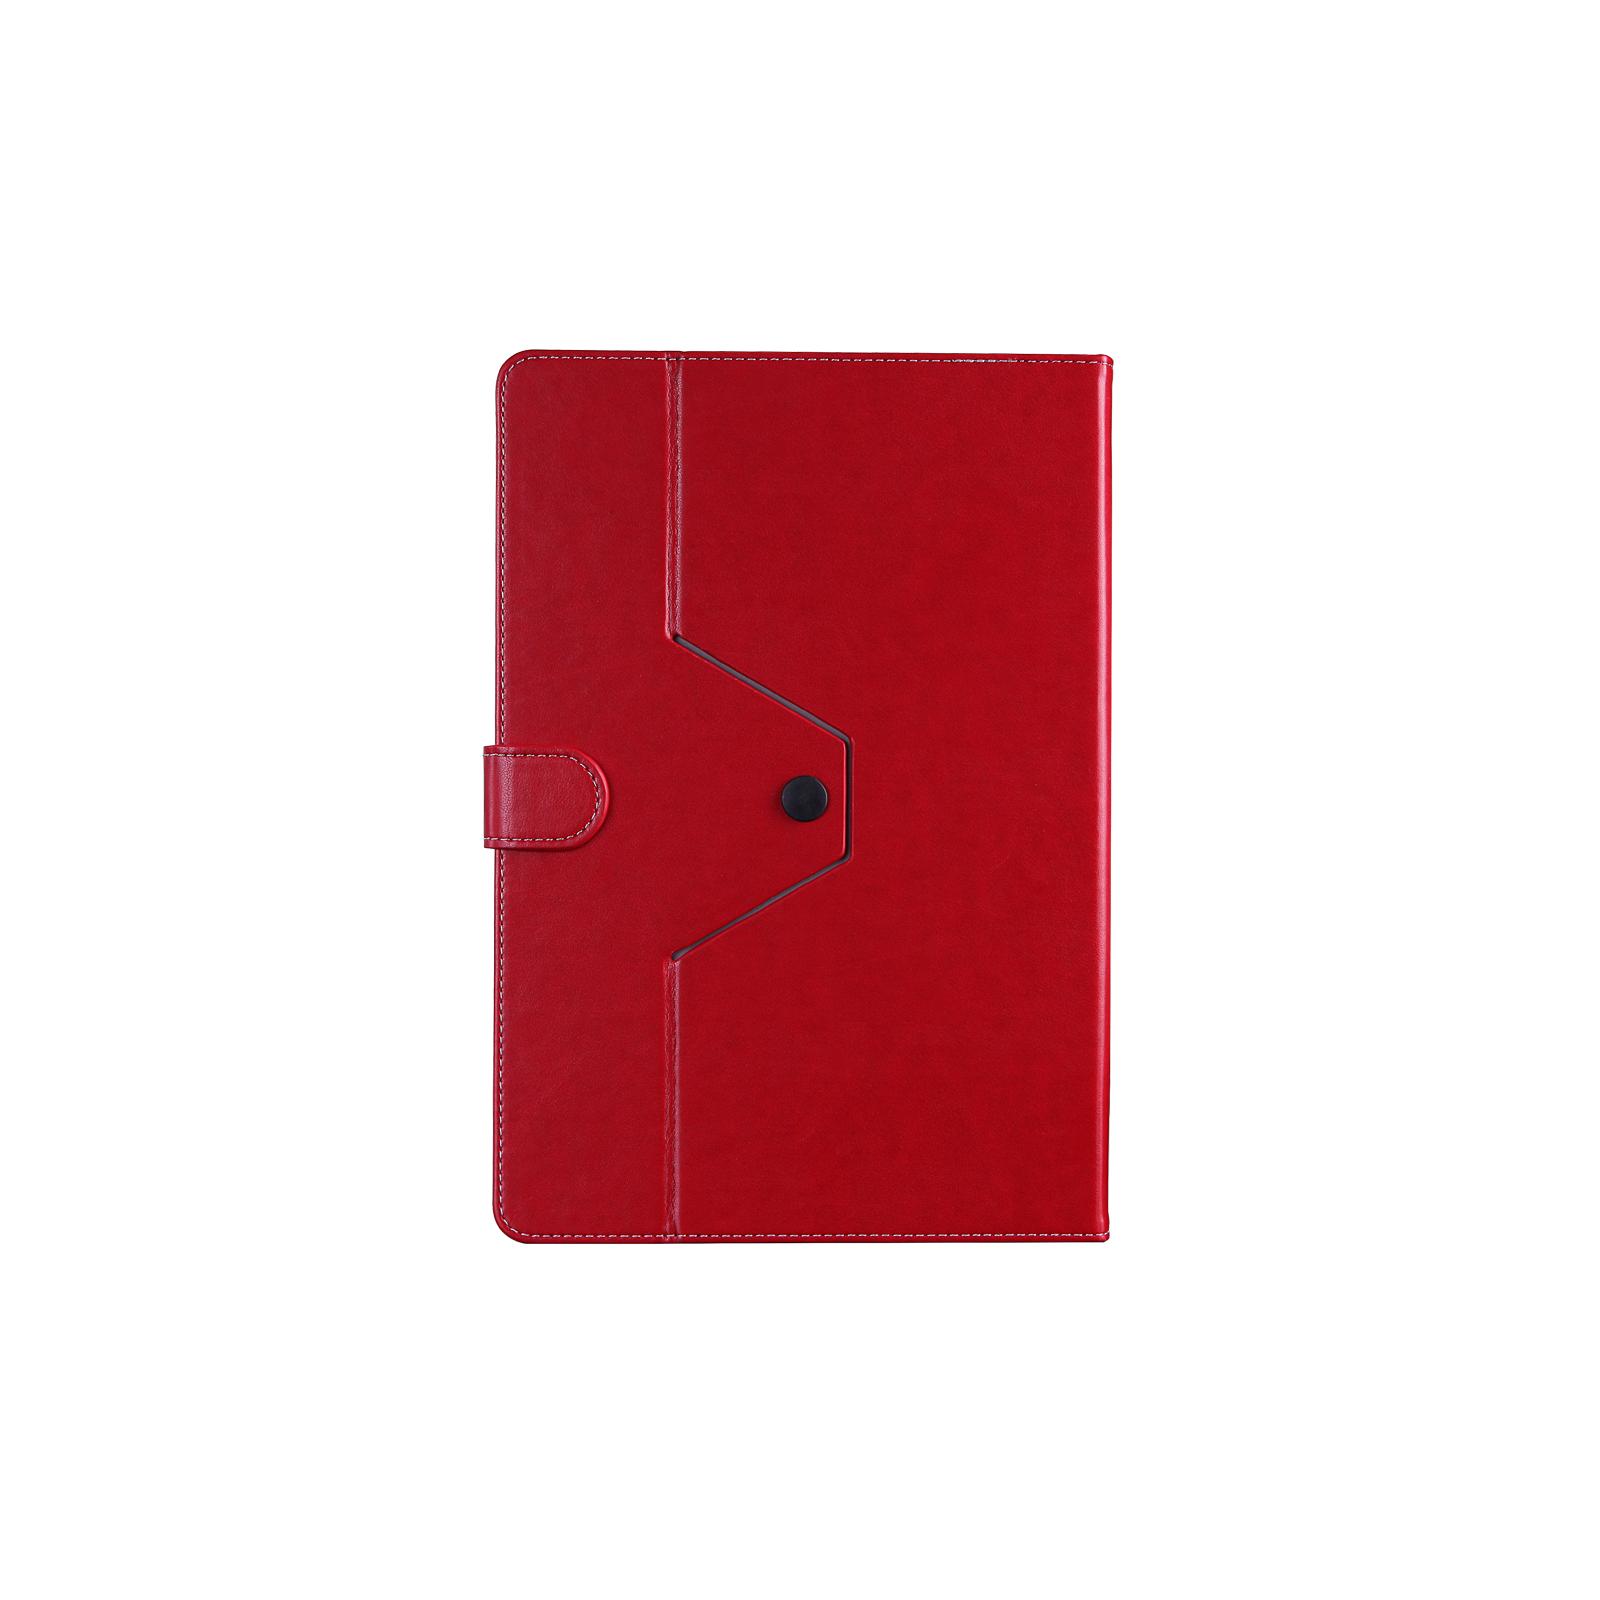 "Чехол для планшета PRESTIGIO 10.1"" Universal rotating RED (PTCL0210RD) изображение 2"